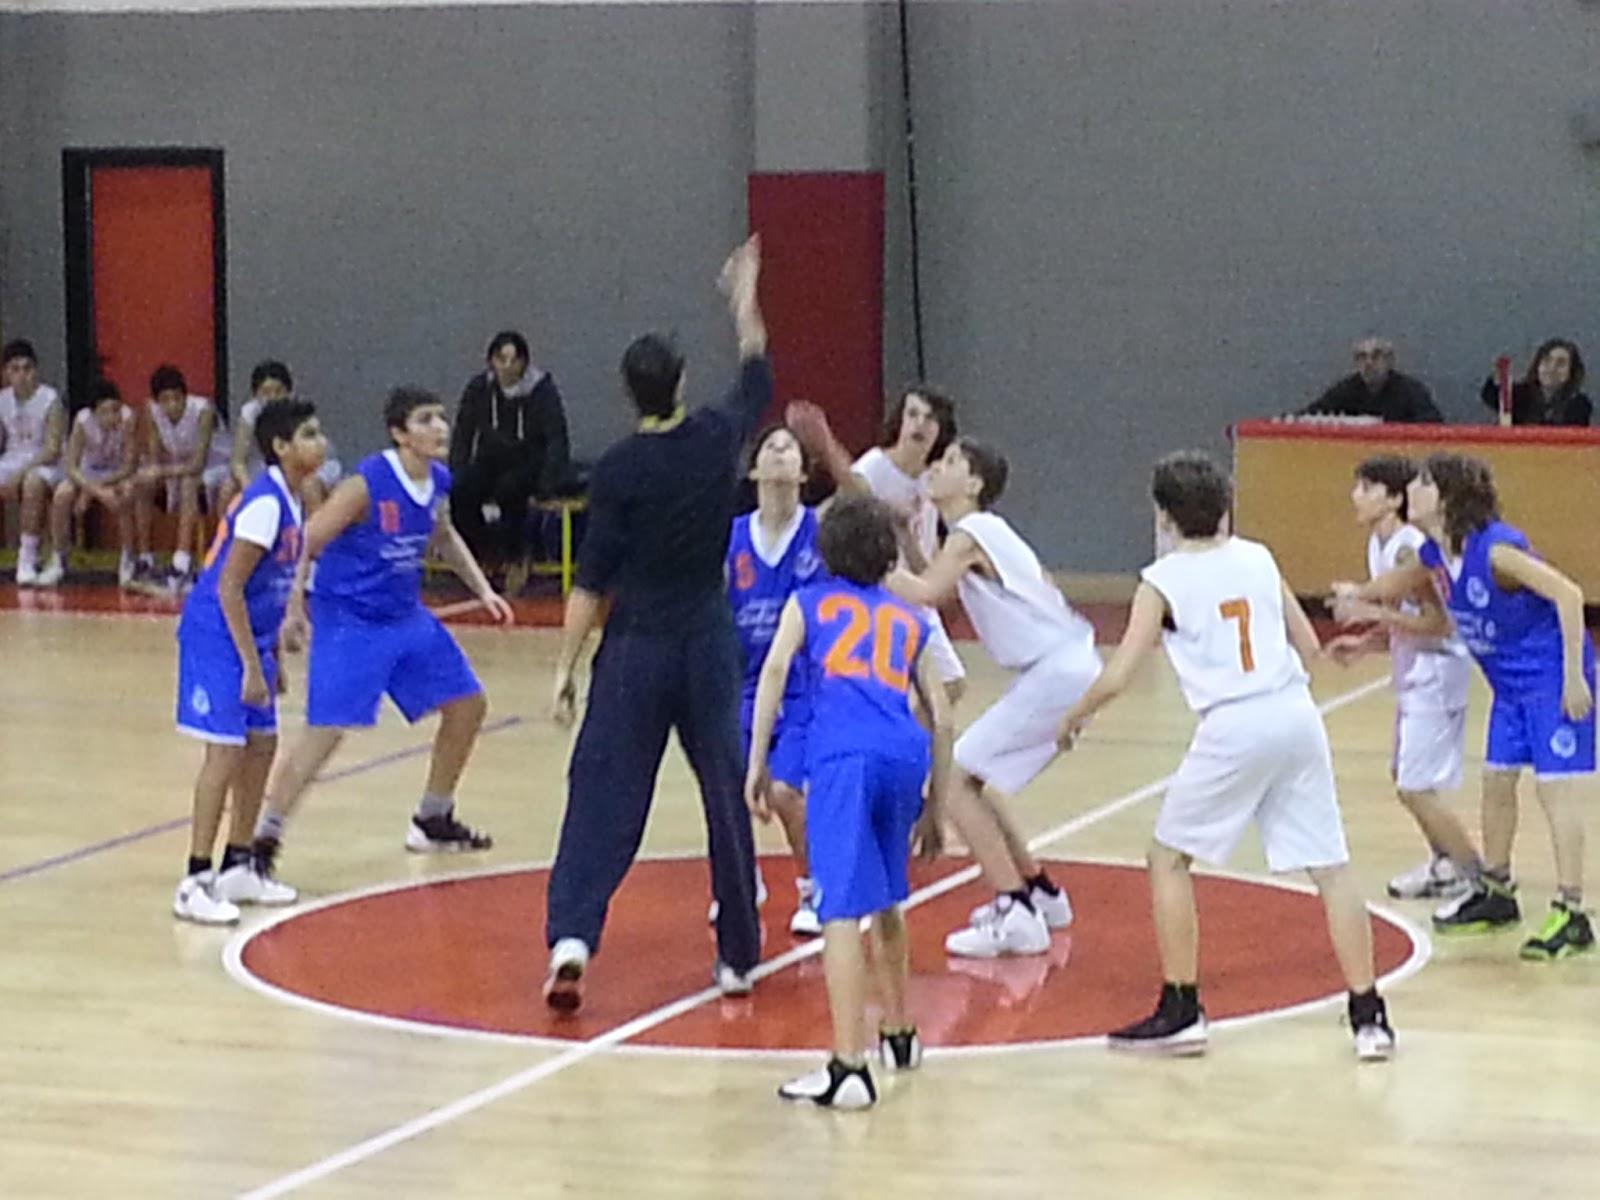 Scuola Media Vergani Novate Milanese.Polisportiva Novate Basket Minibasket